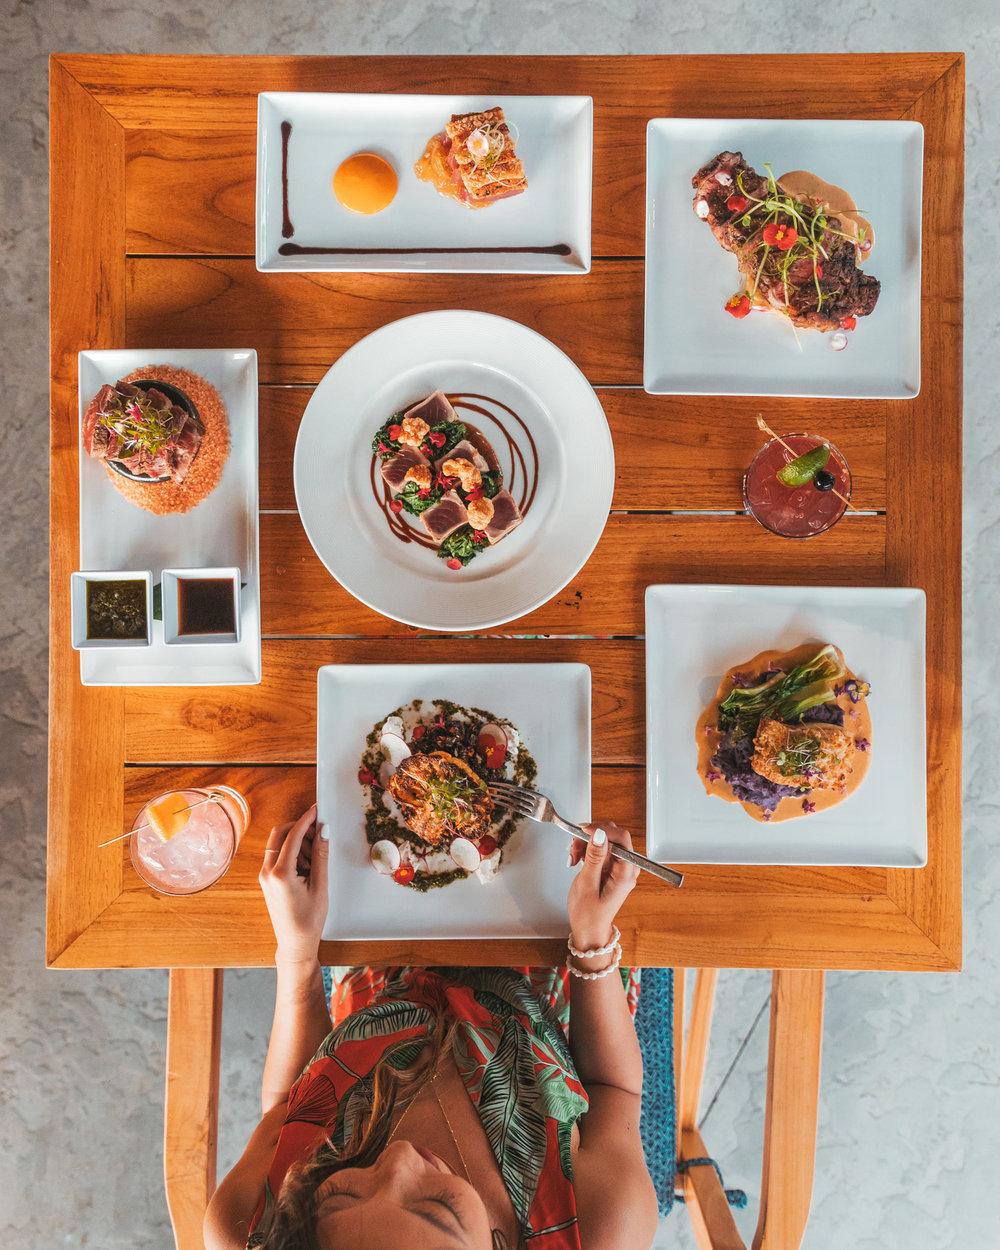 Mauka Makai dinner at Westin Nanea // The Quick Guide to Visiting Maui, Hawaii #readysetjetset #hawaii #maui